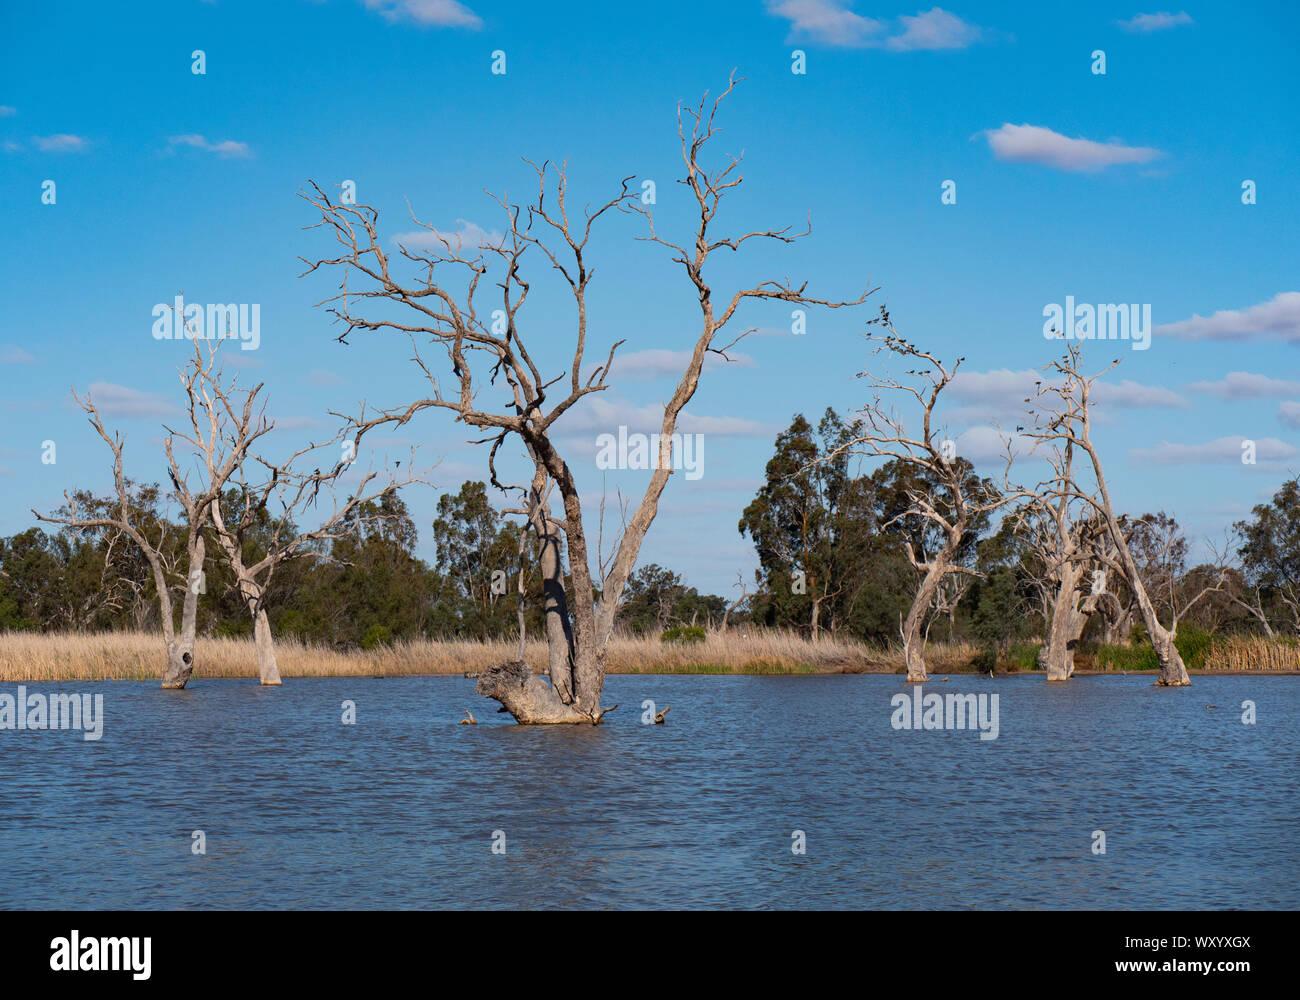 Wetland bird habitat at Warren New South Wales Australia. A popular destination from Naromine and Dubbo. Stock Photo